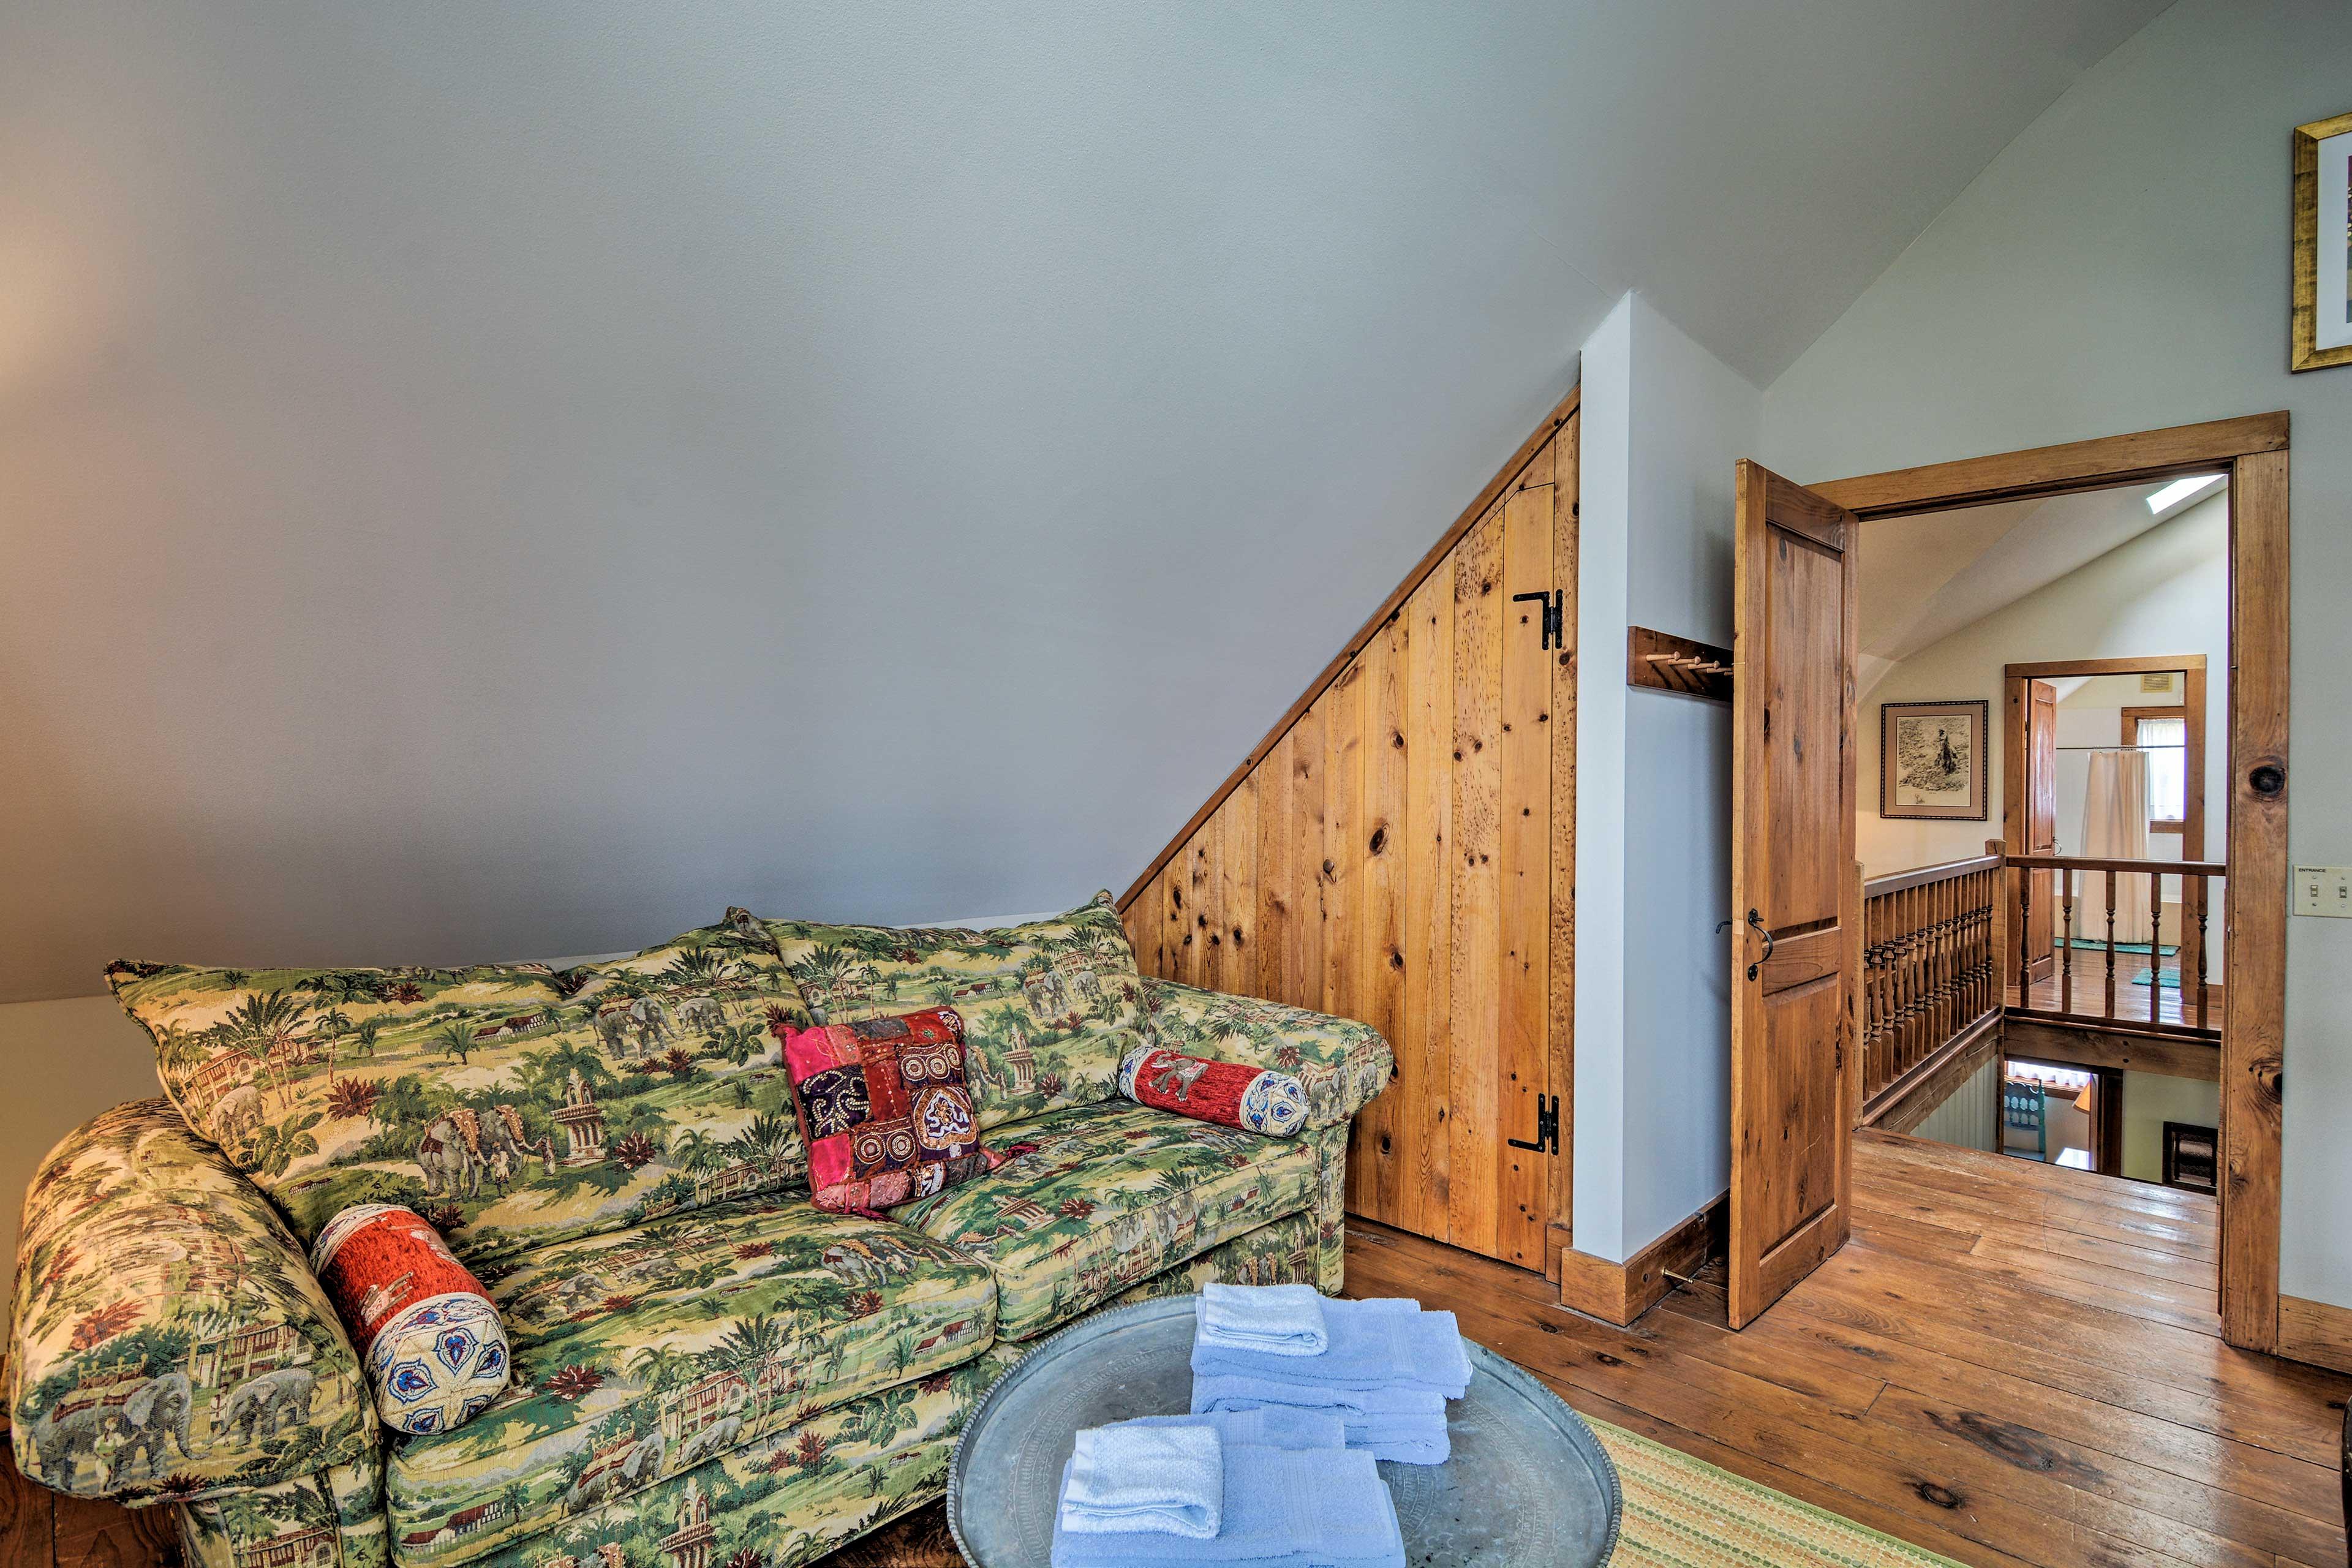 Find a quiet retreat in the comfort of the bedroom.